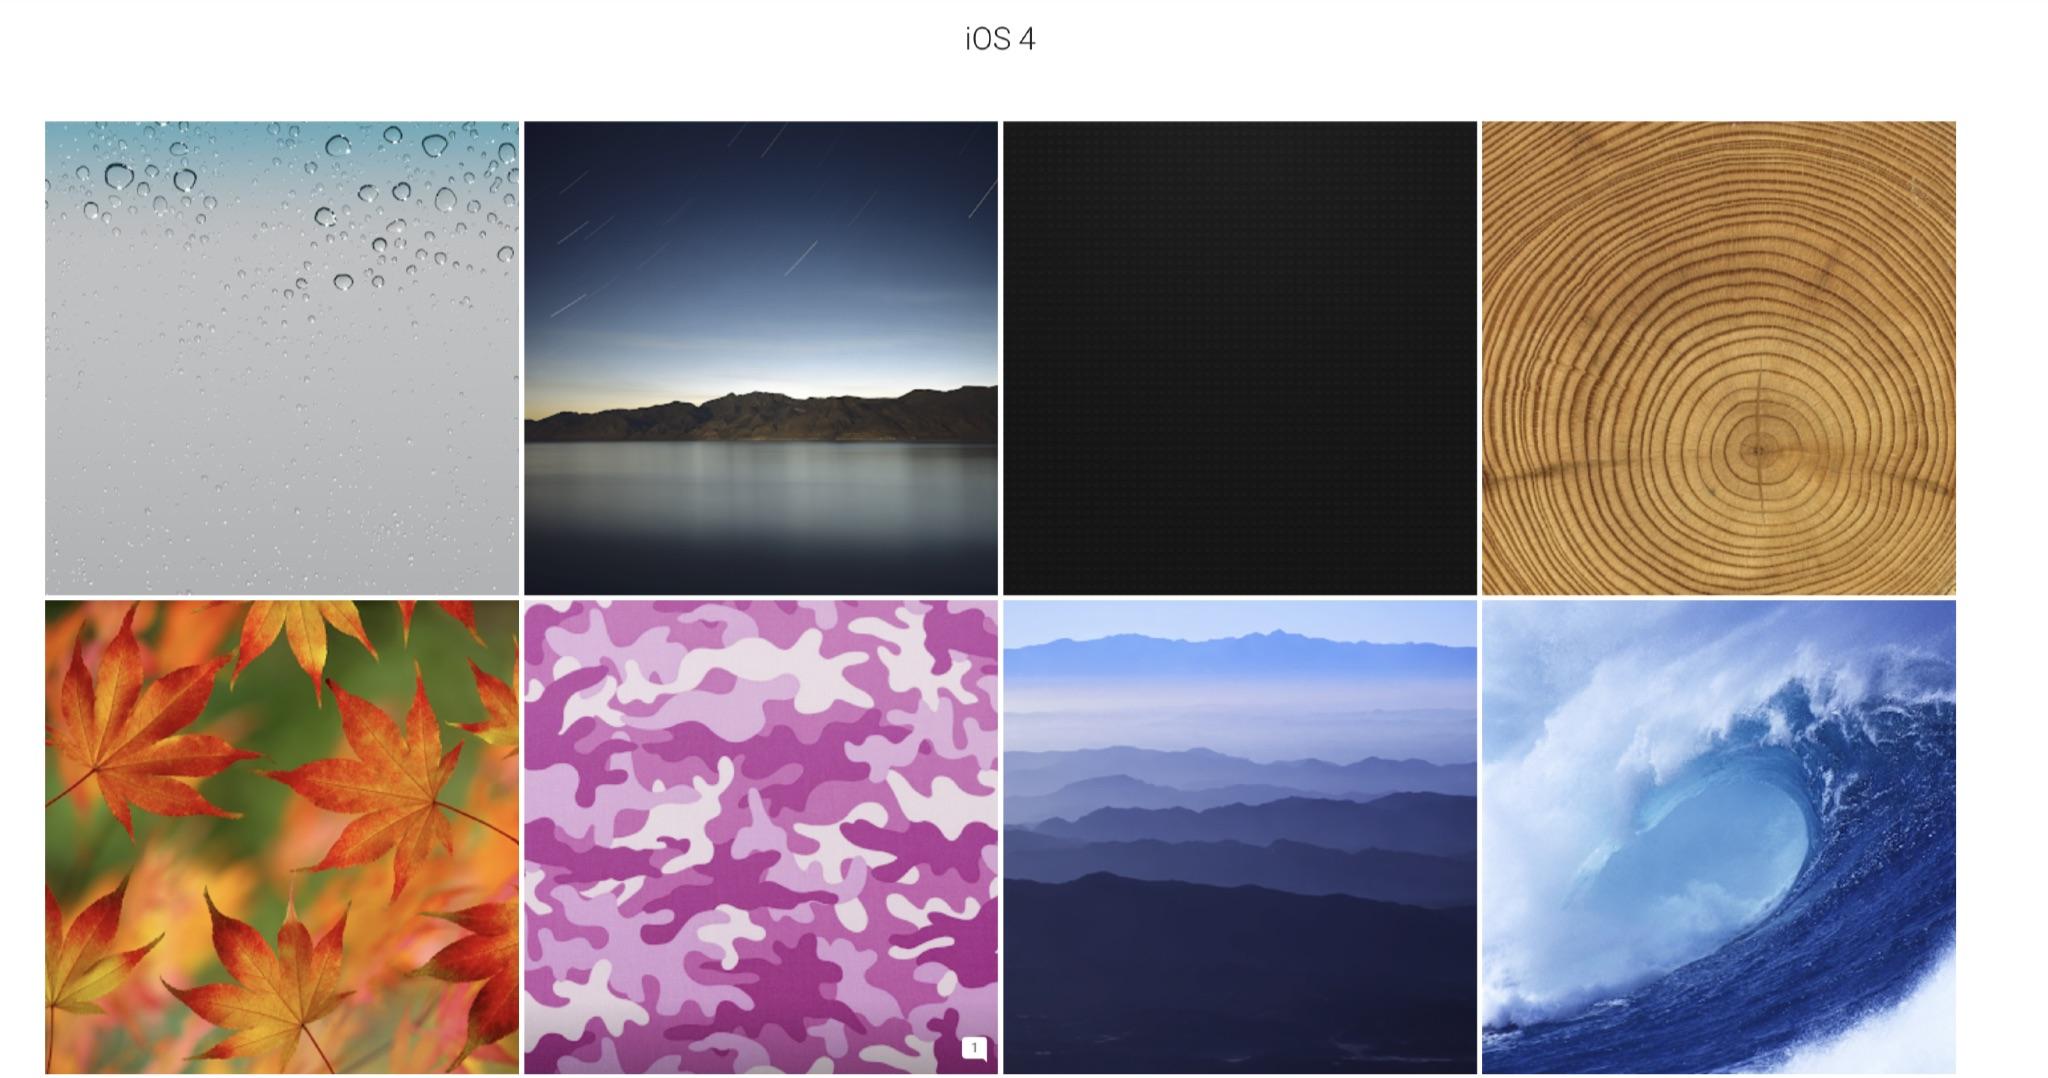 Photos Download Originals To This Mac